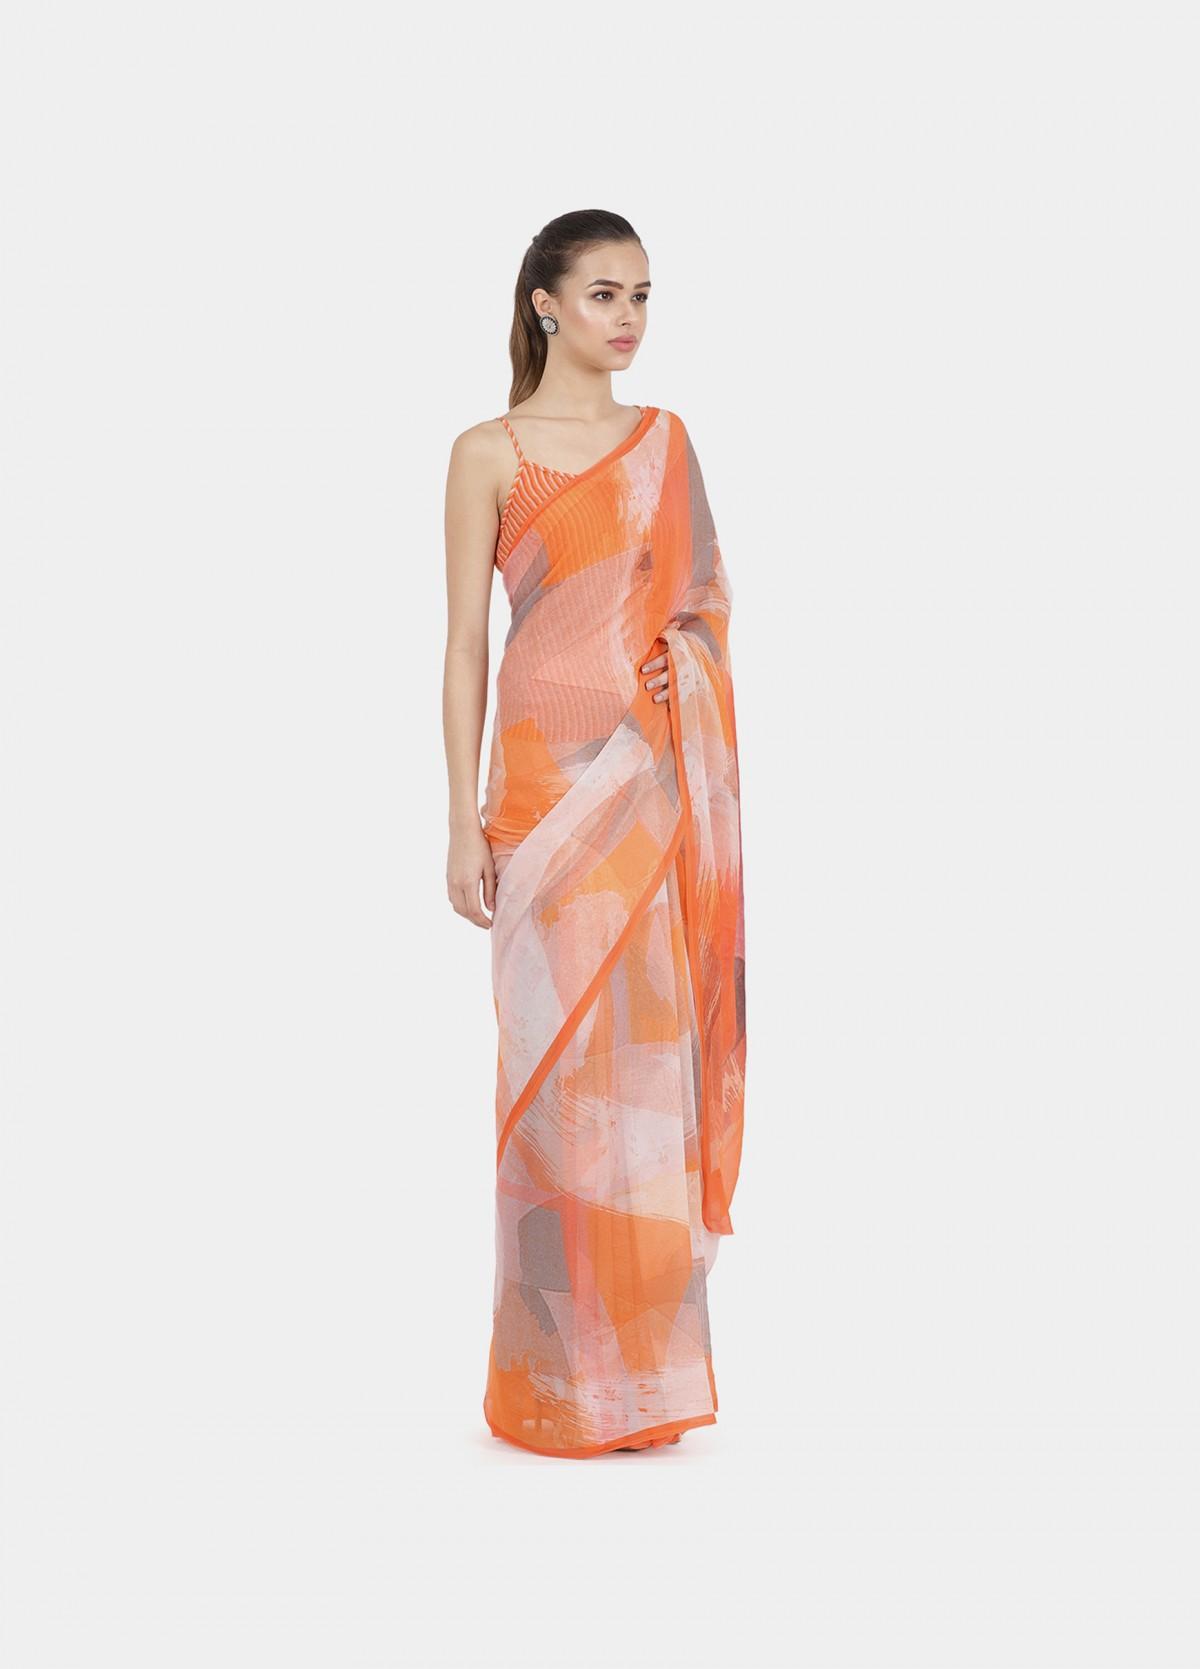 The Spring Sari